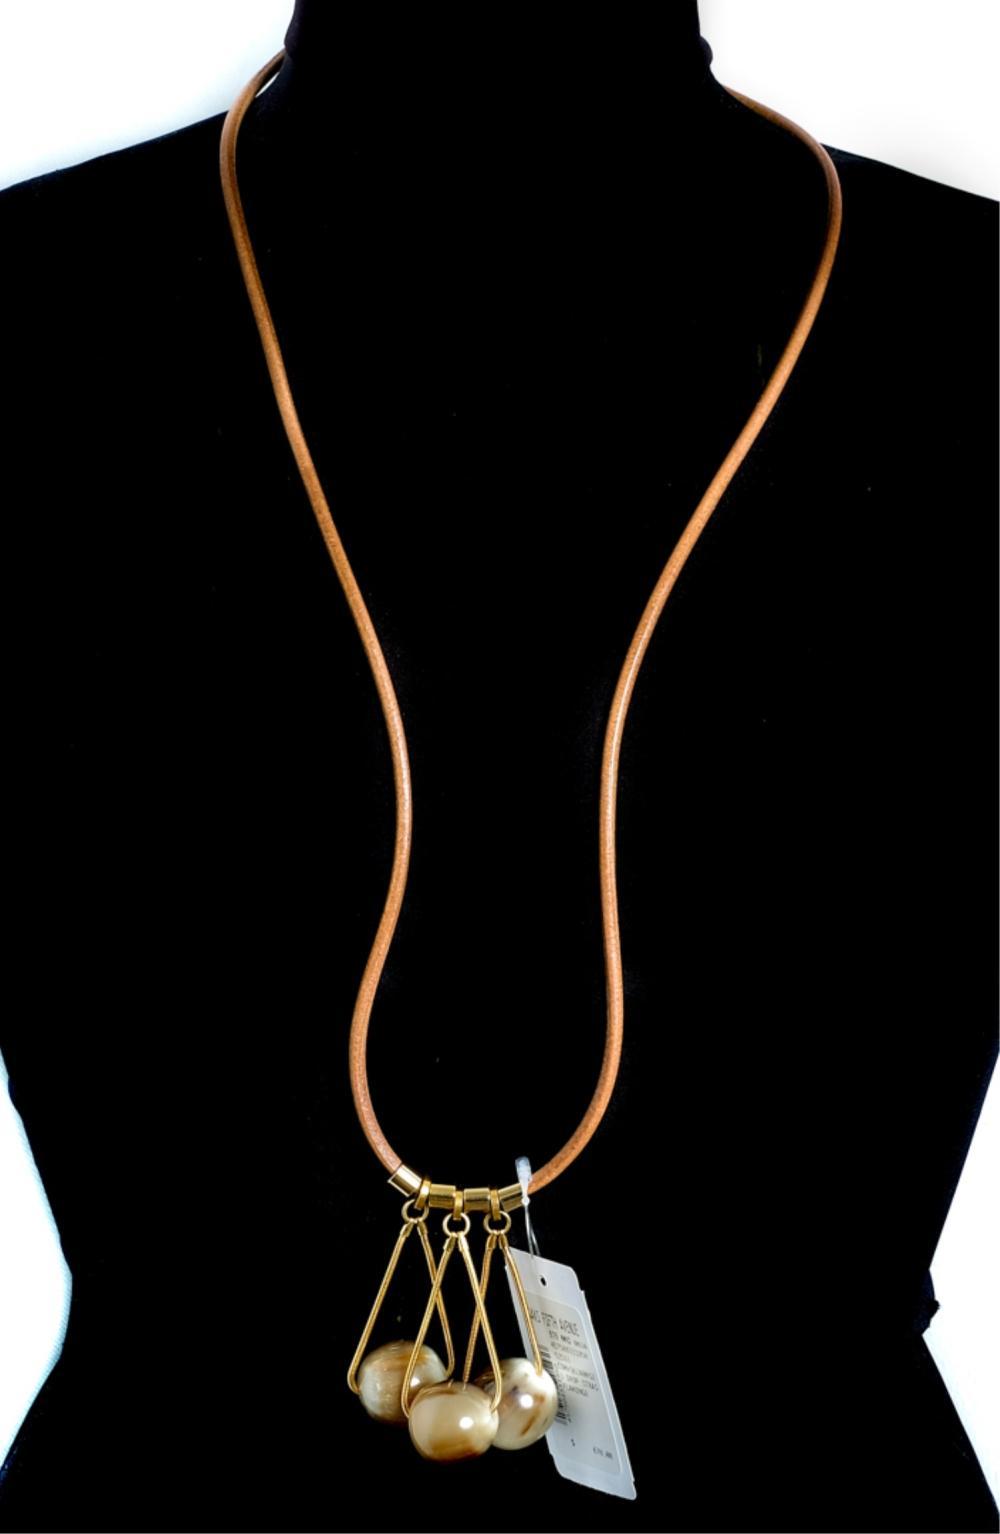 NWT MARNI Designer Collana Corno Horn Necklace